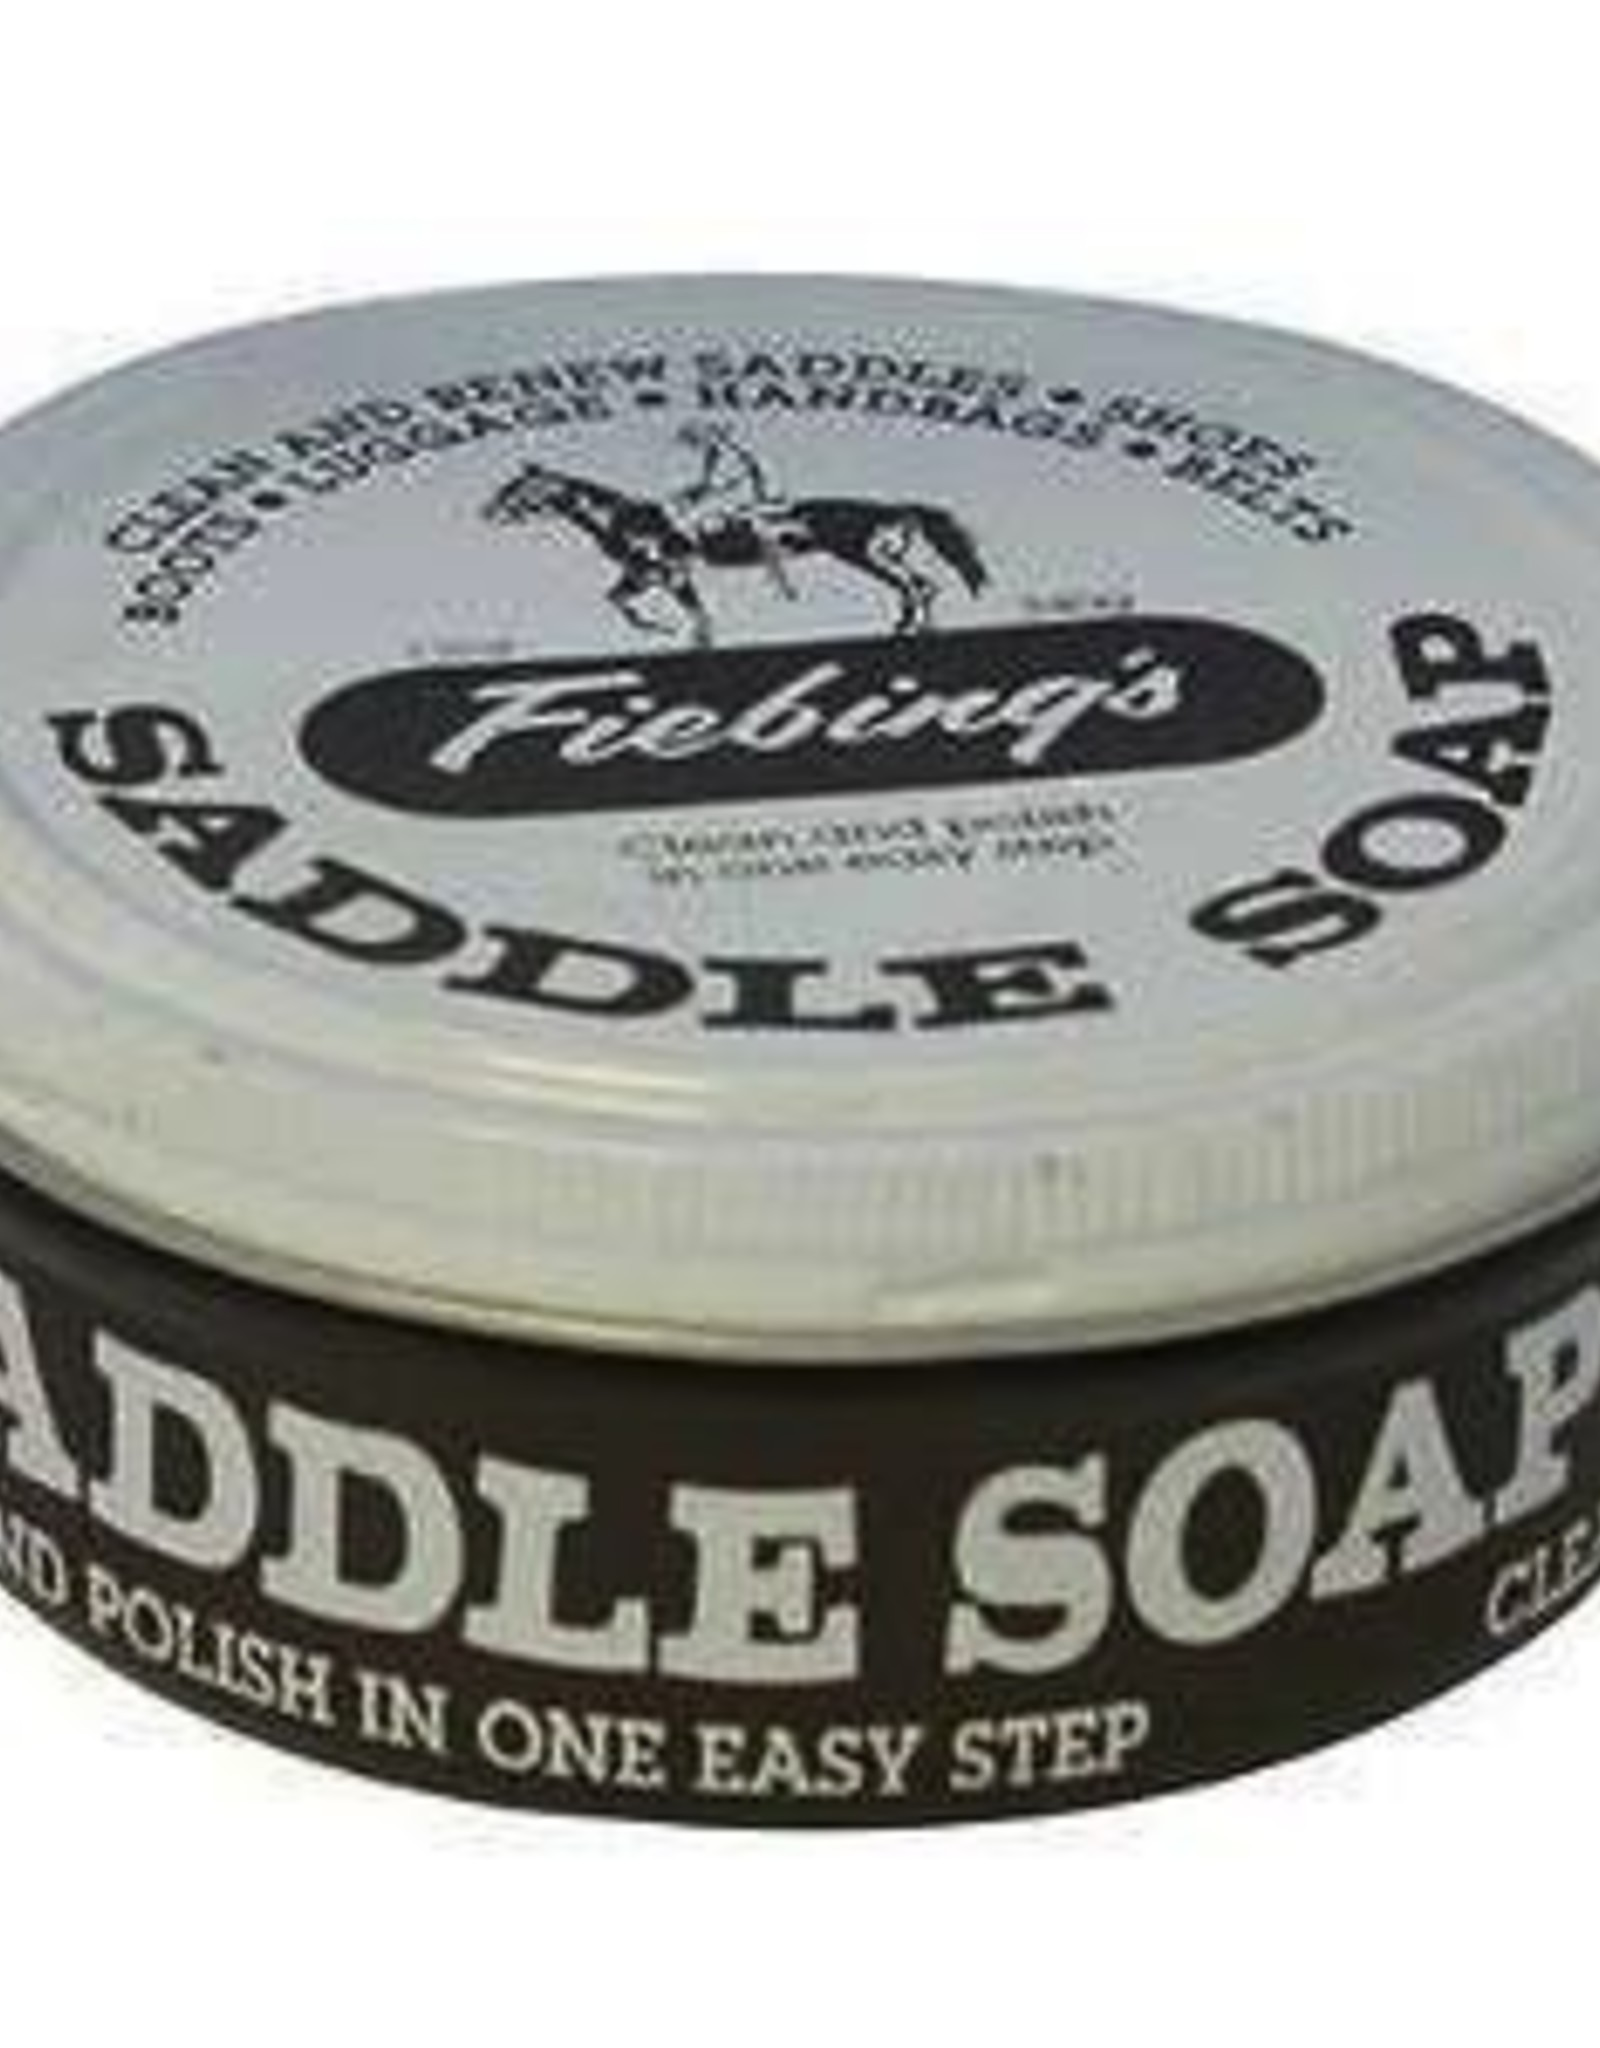 Fiebing's White Saddle Soap - 12oz